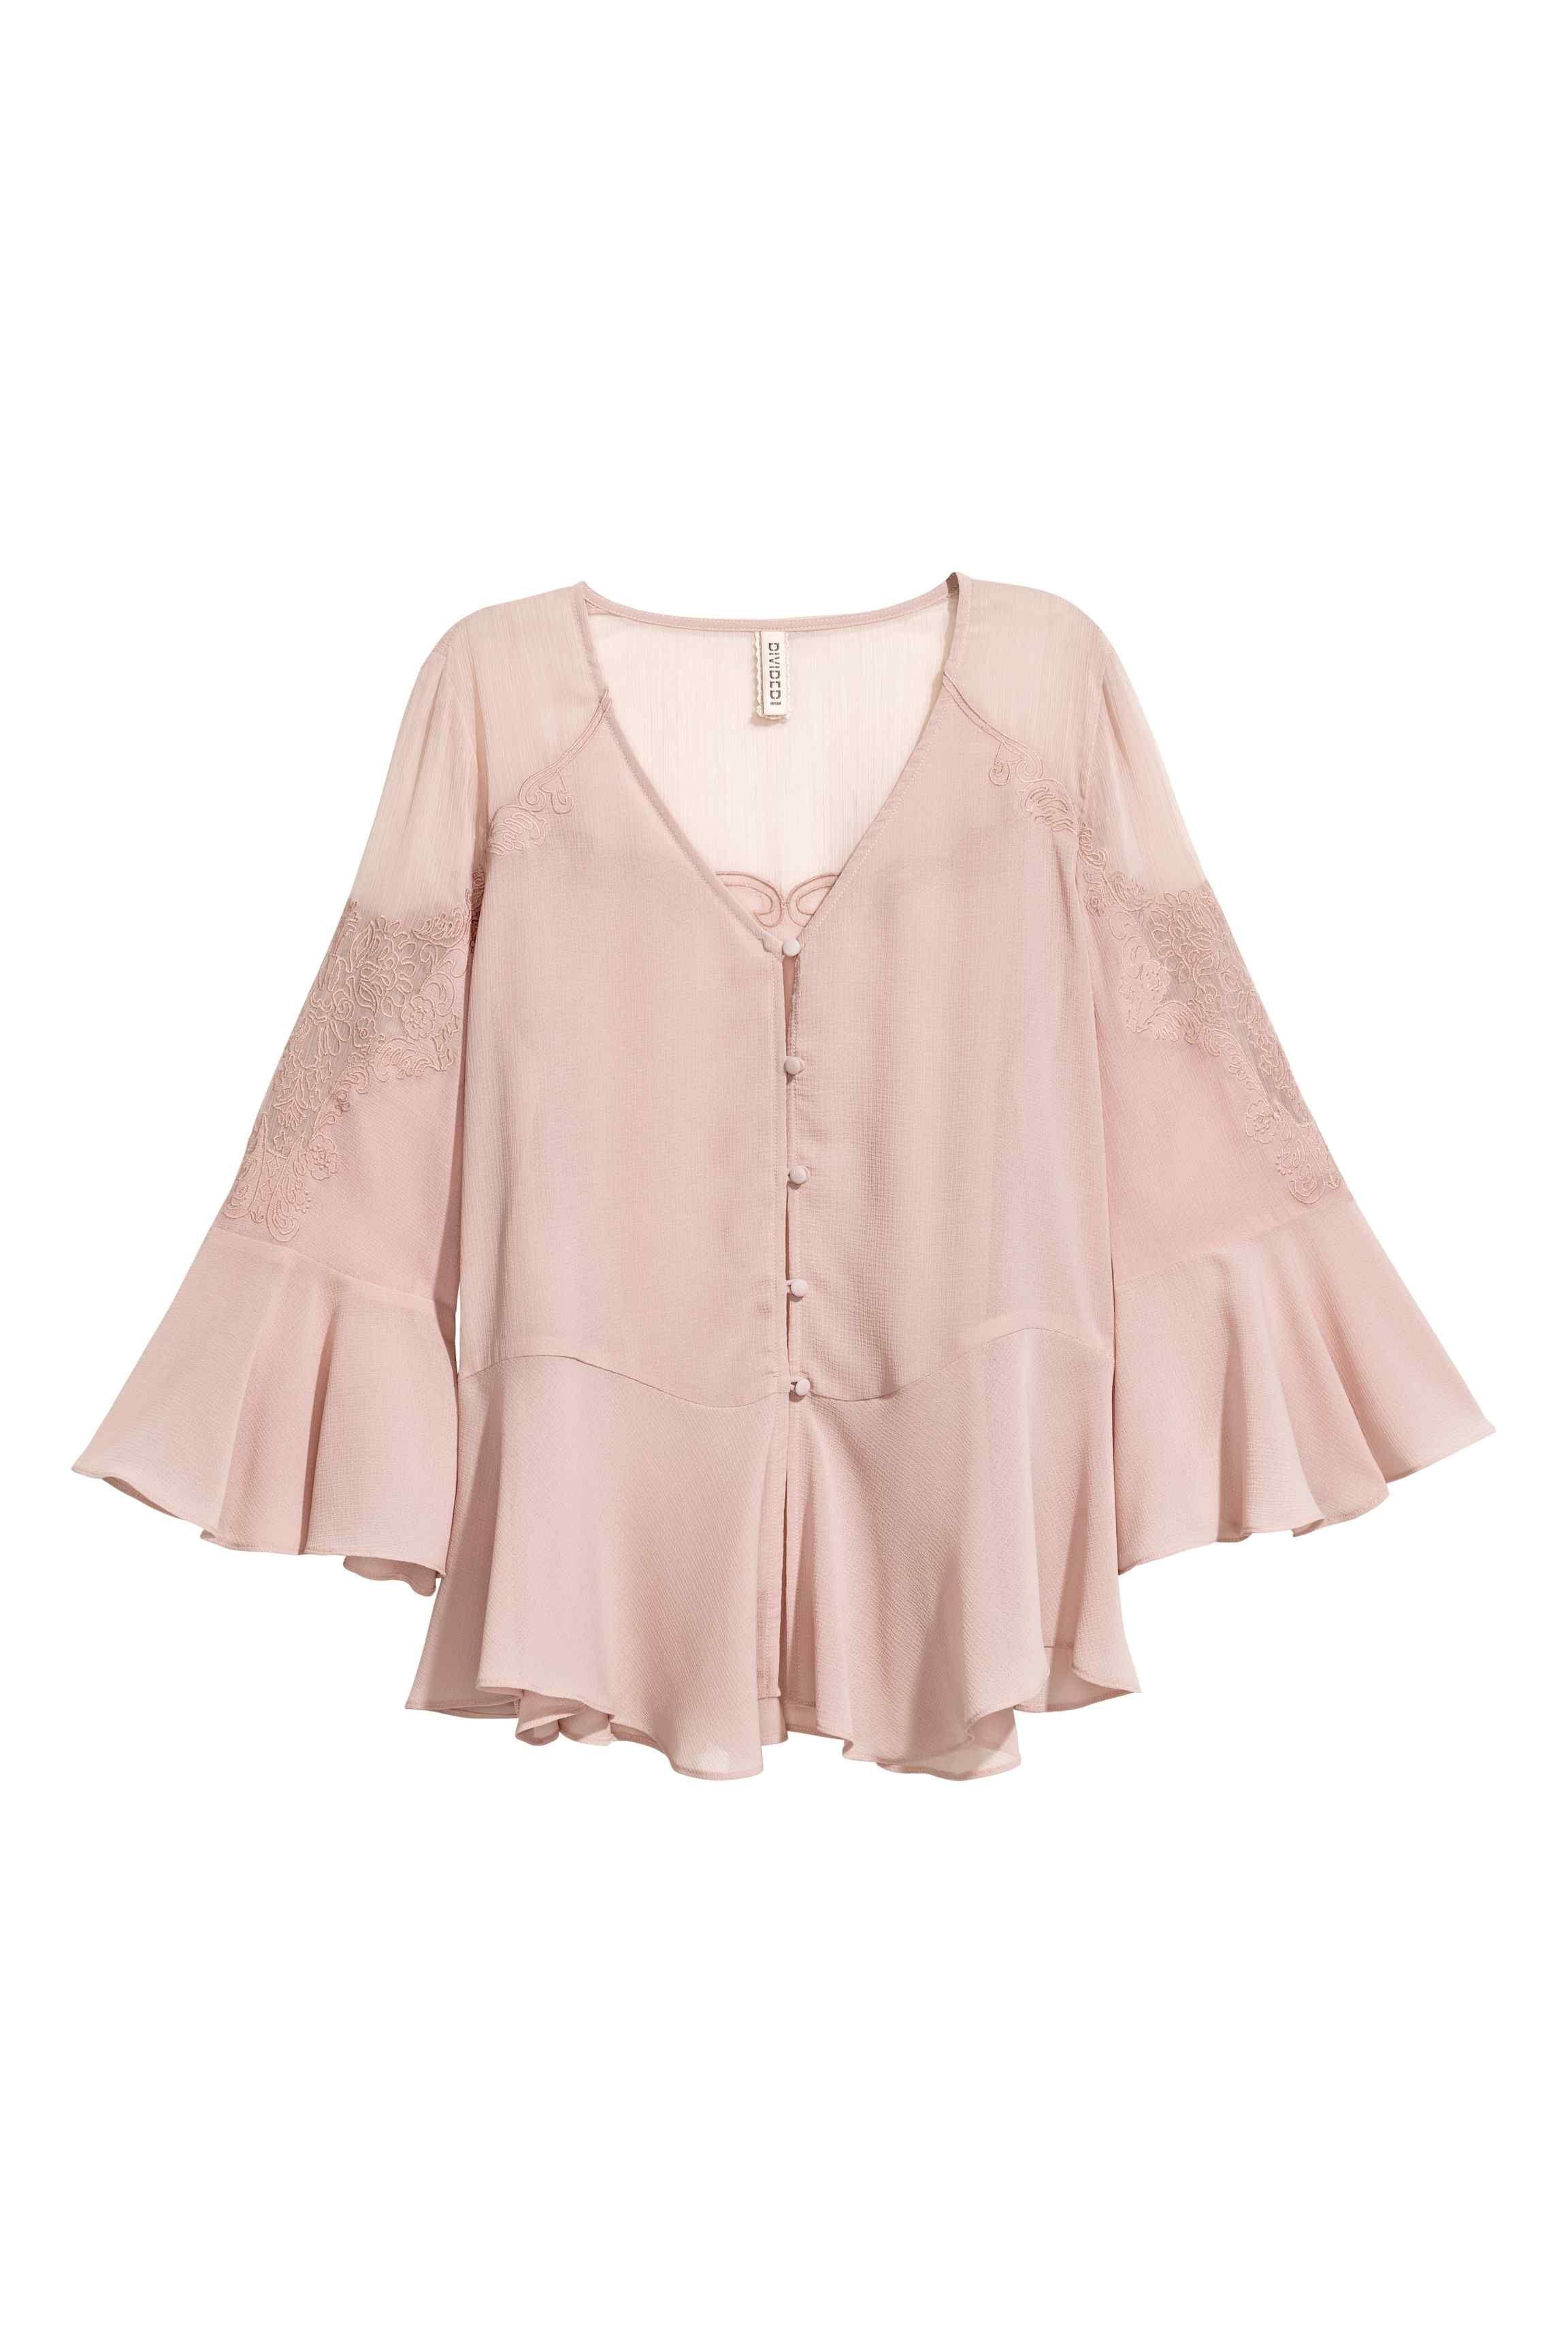 6b75599d865332 Wide chiffon blouse - Light old rose - Ladies